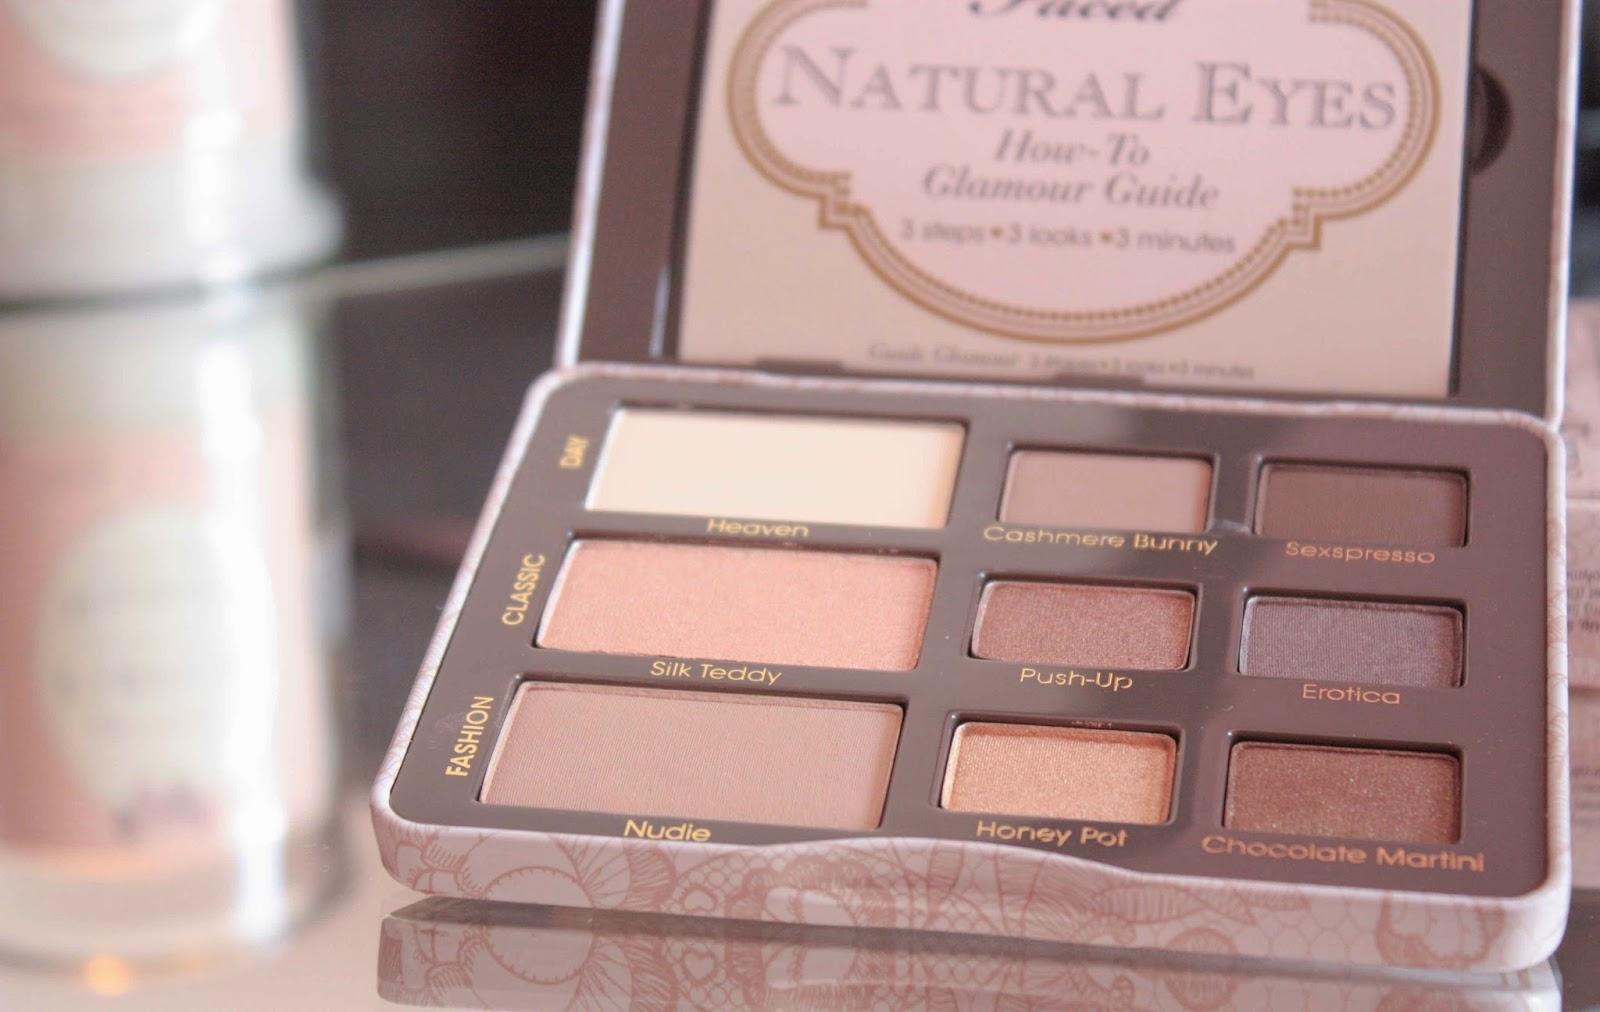 Beautylogie Too Faced Natural Eye Palette All Time Favorite